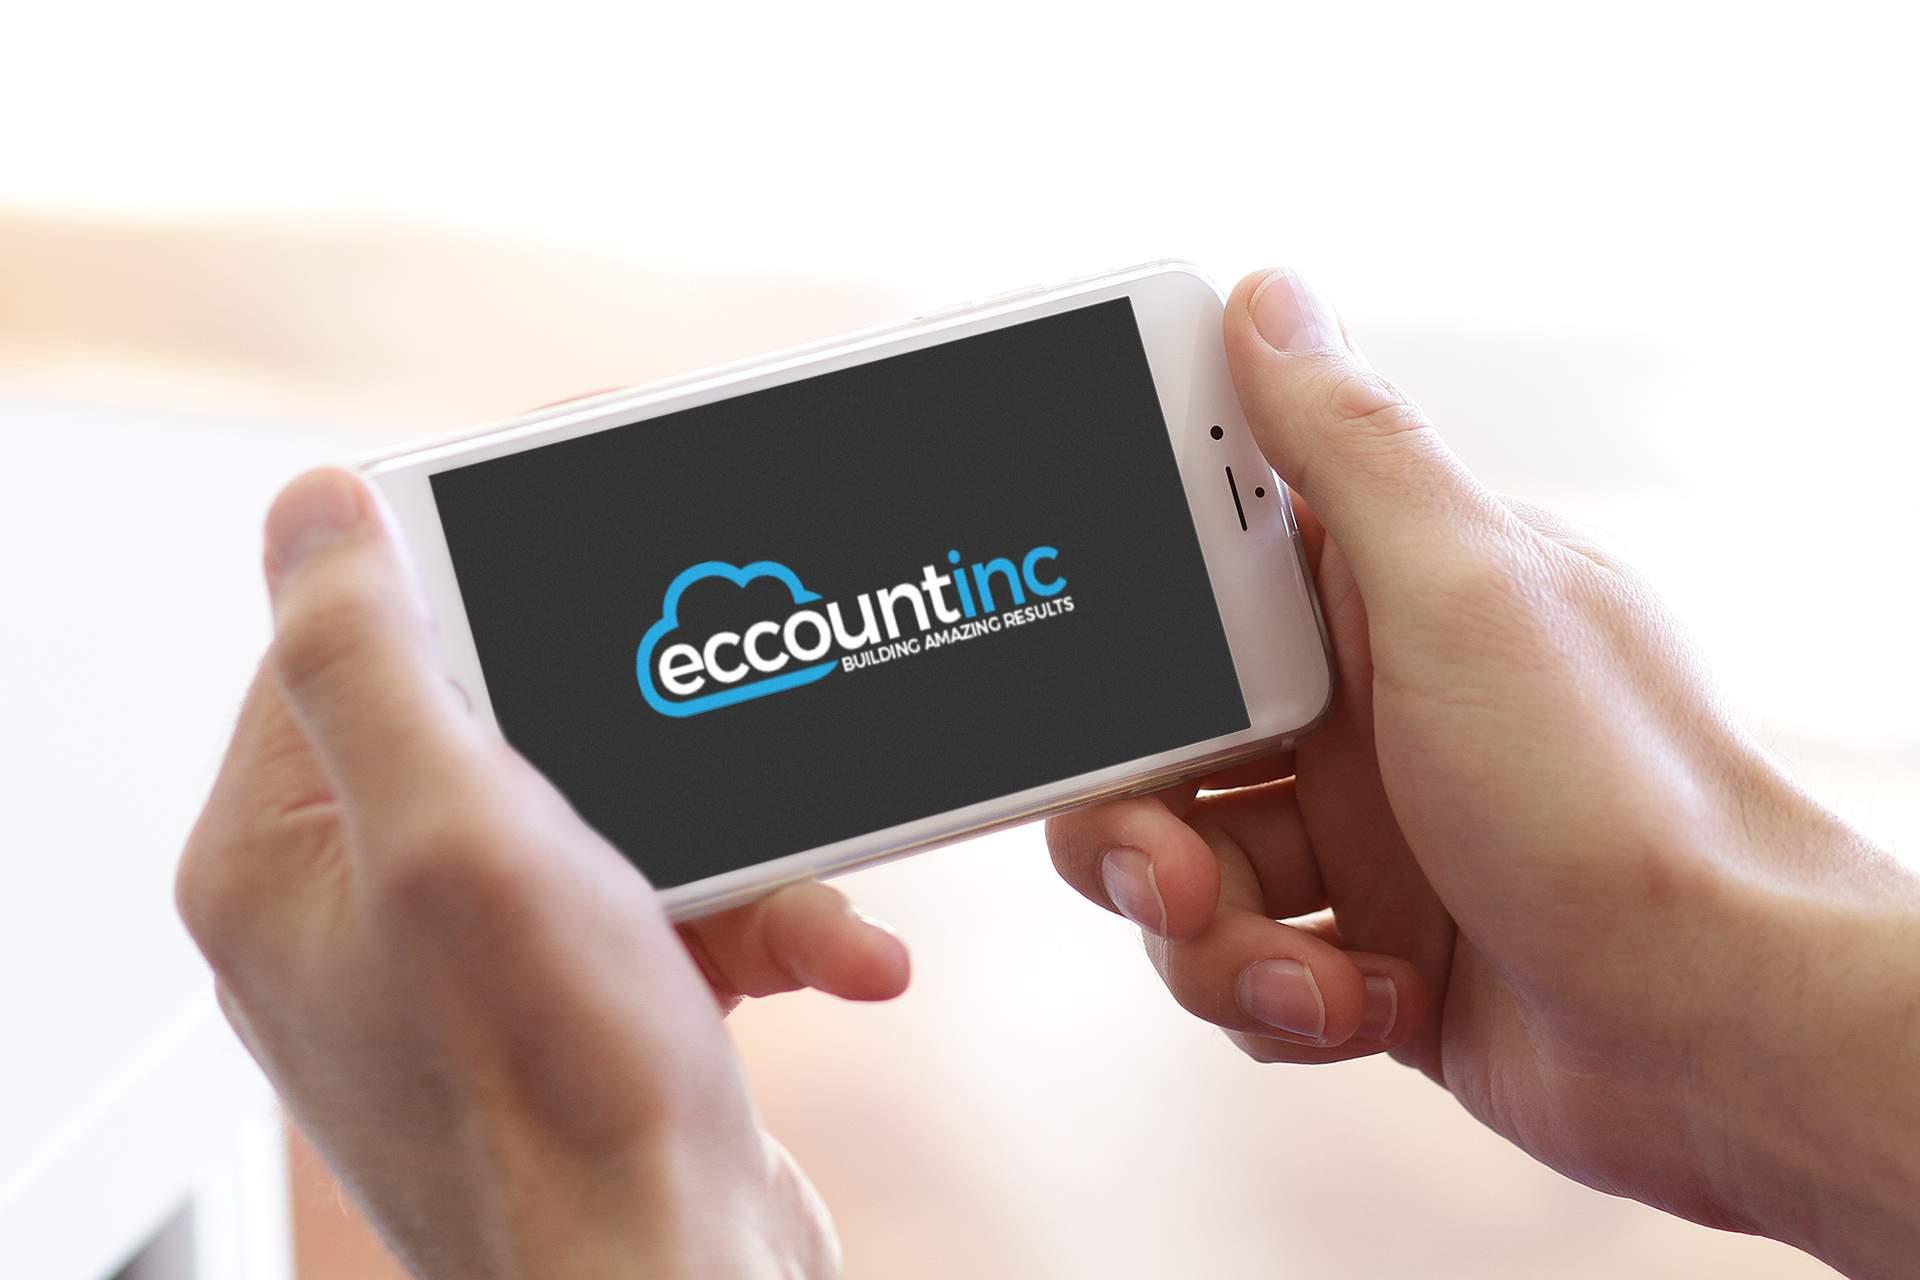 eccountinc on mobile